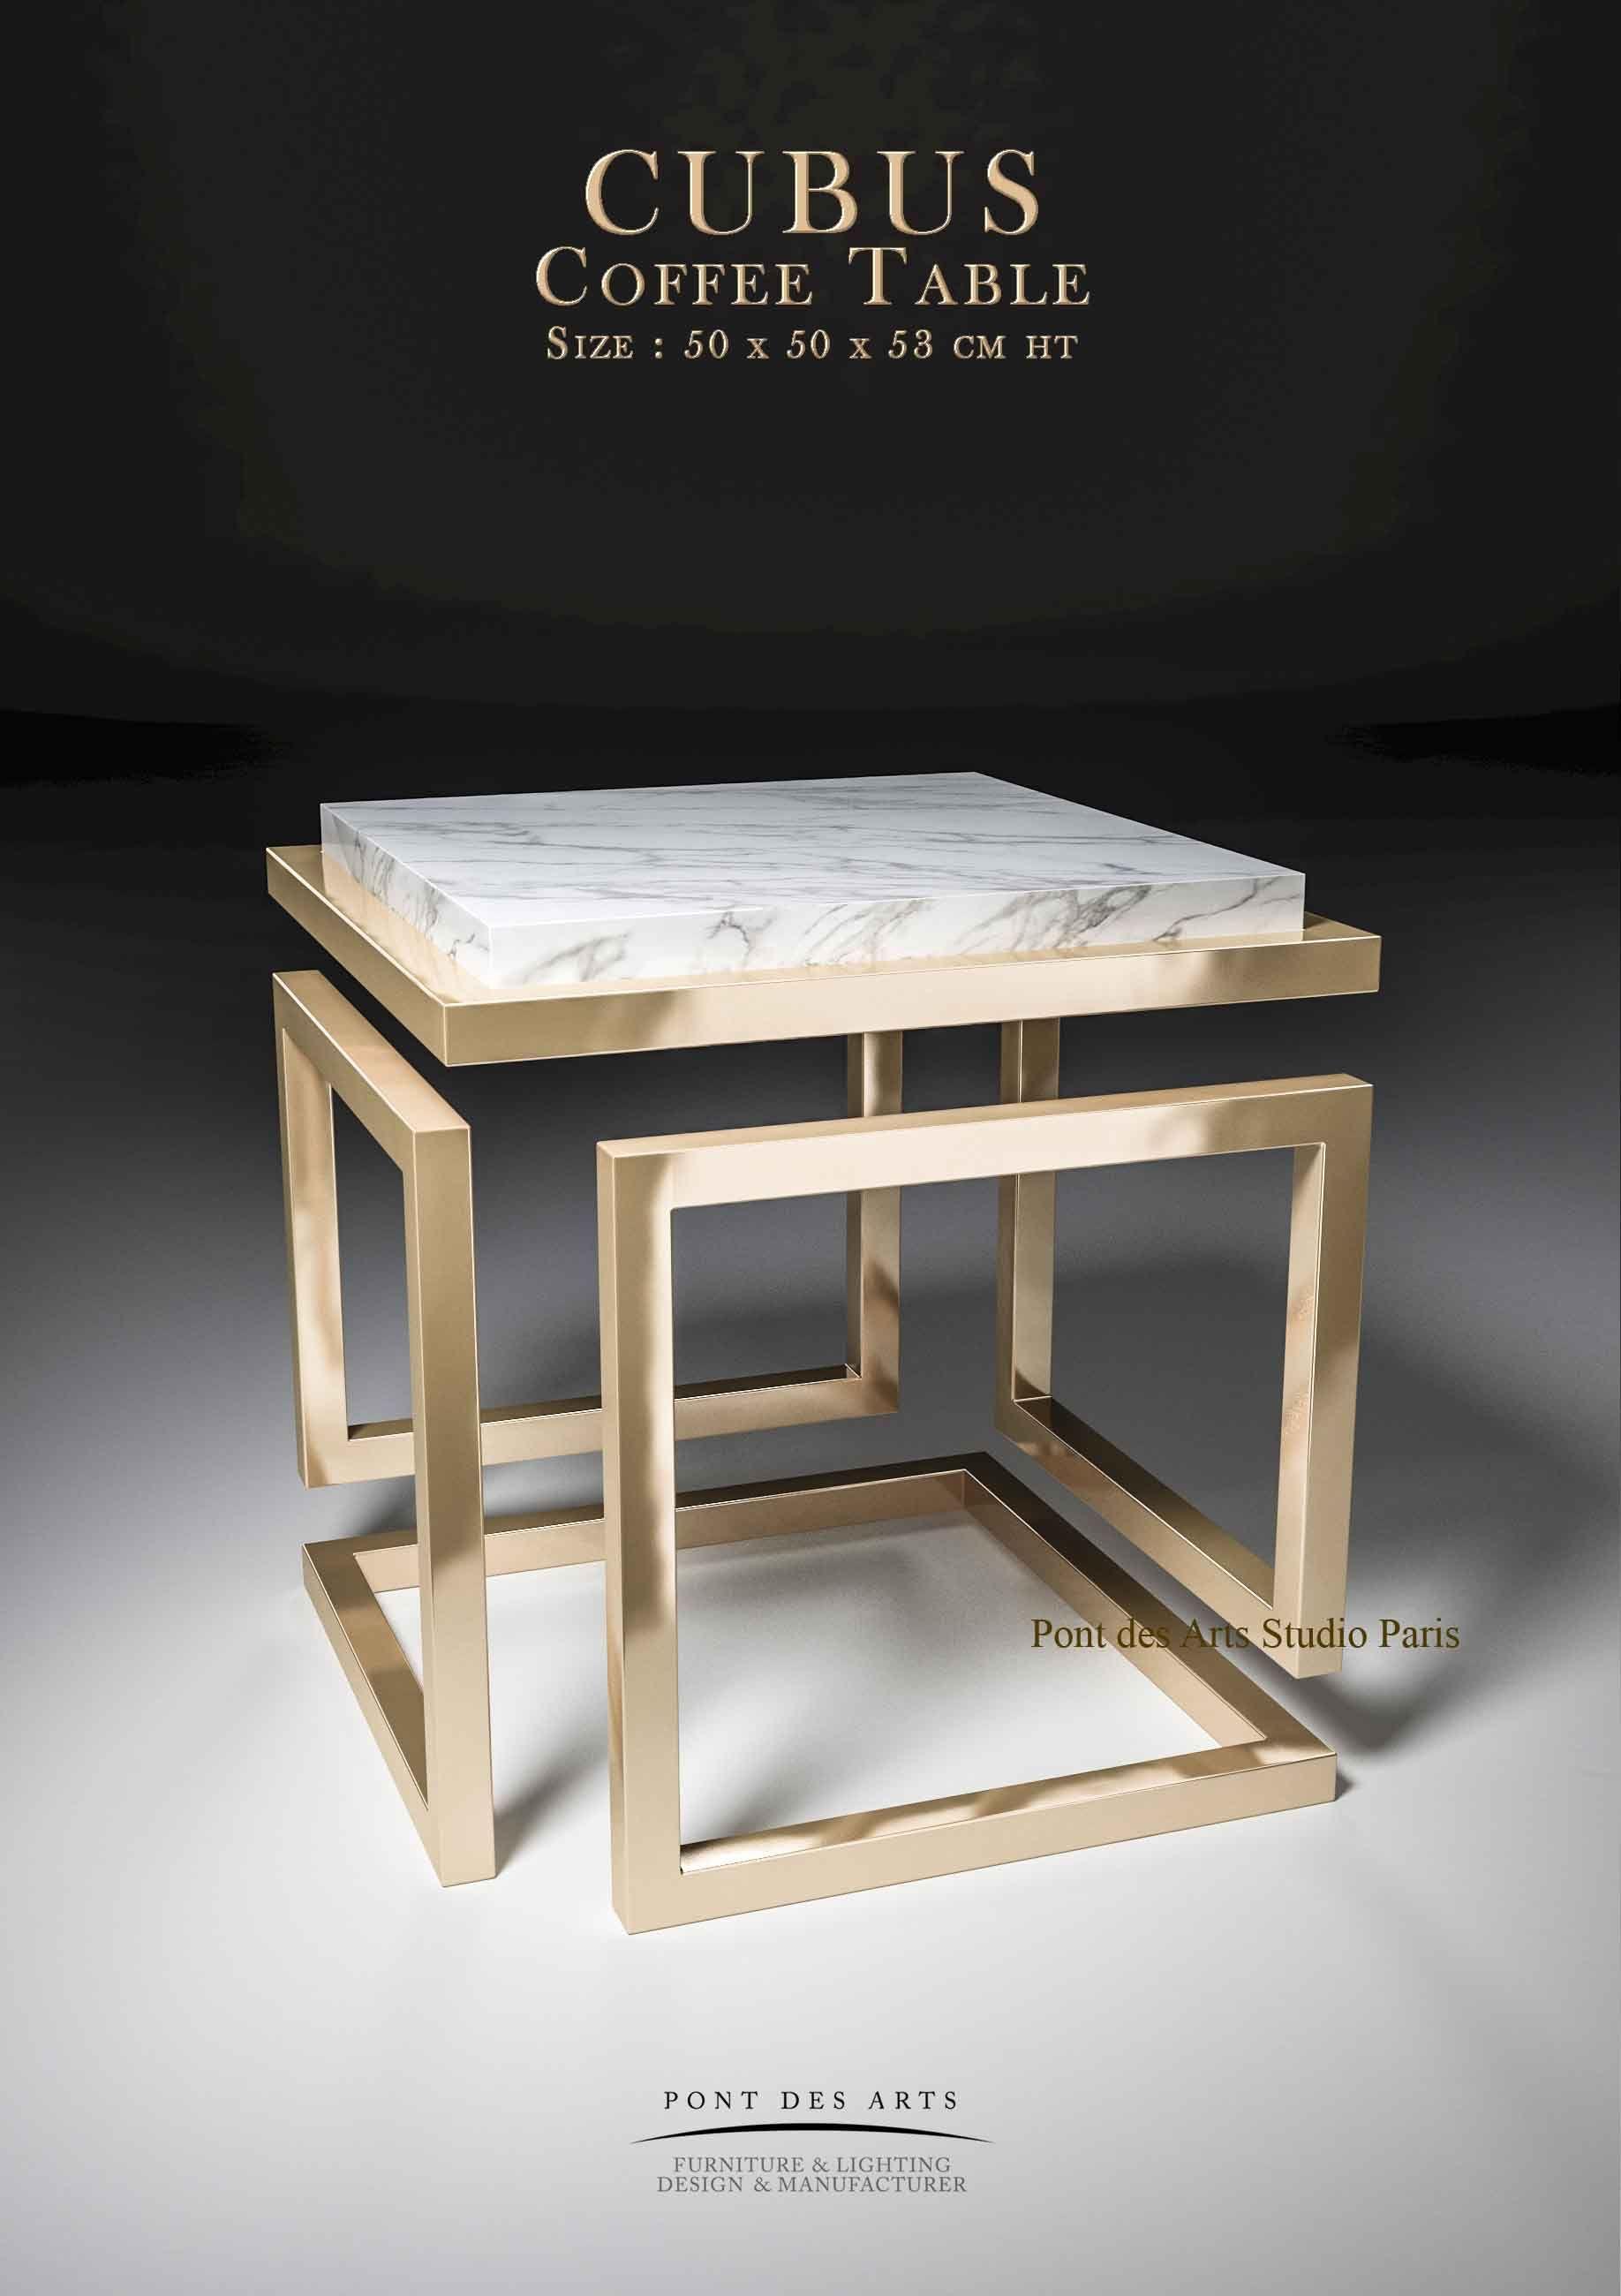 - 40+ Creative DIY Coffee Table Ideas You Can Build Yourself